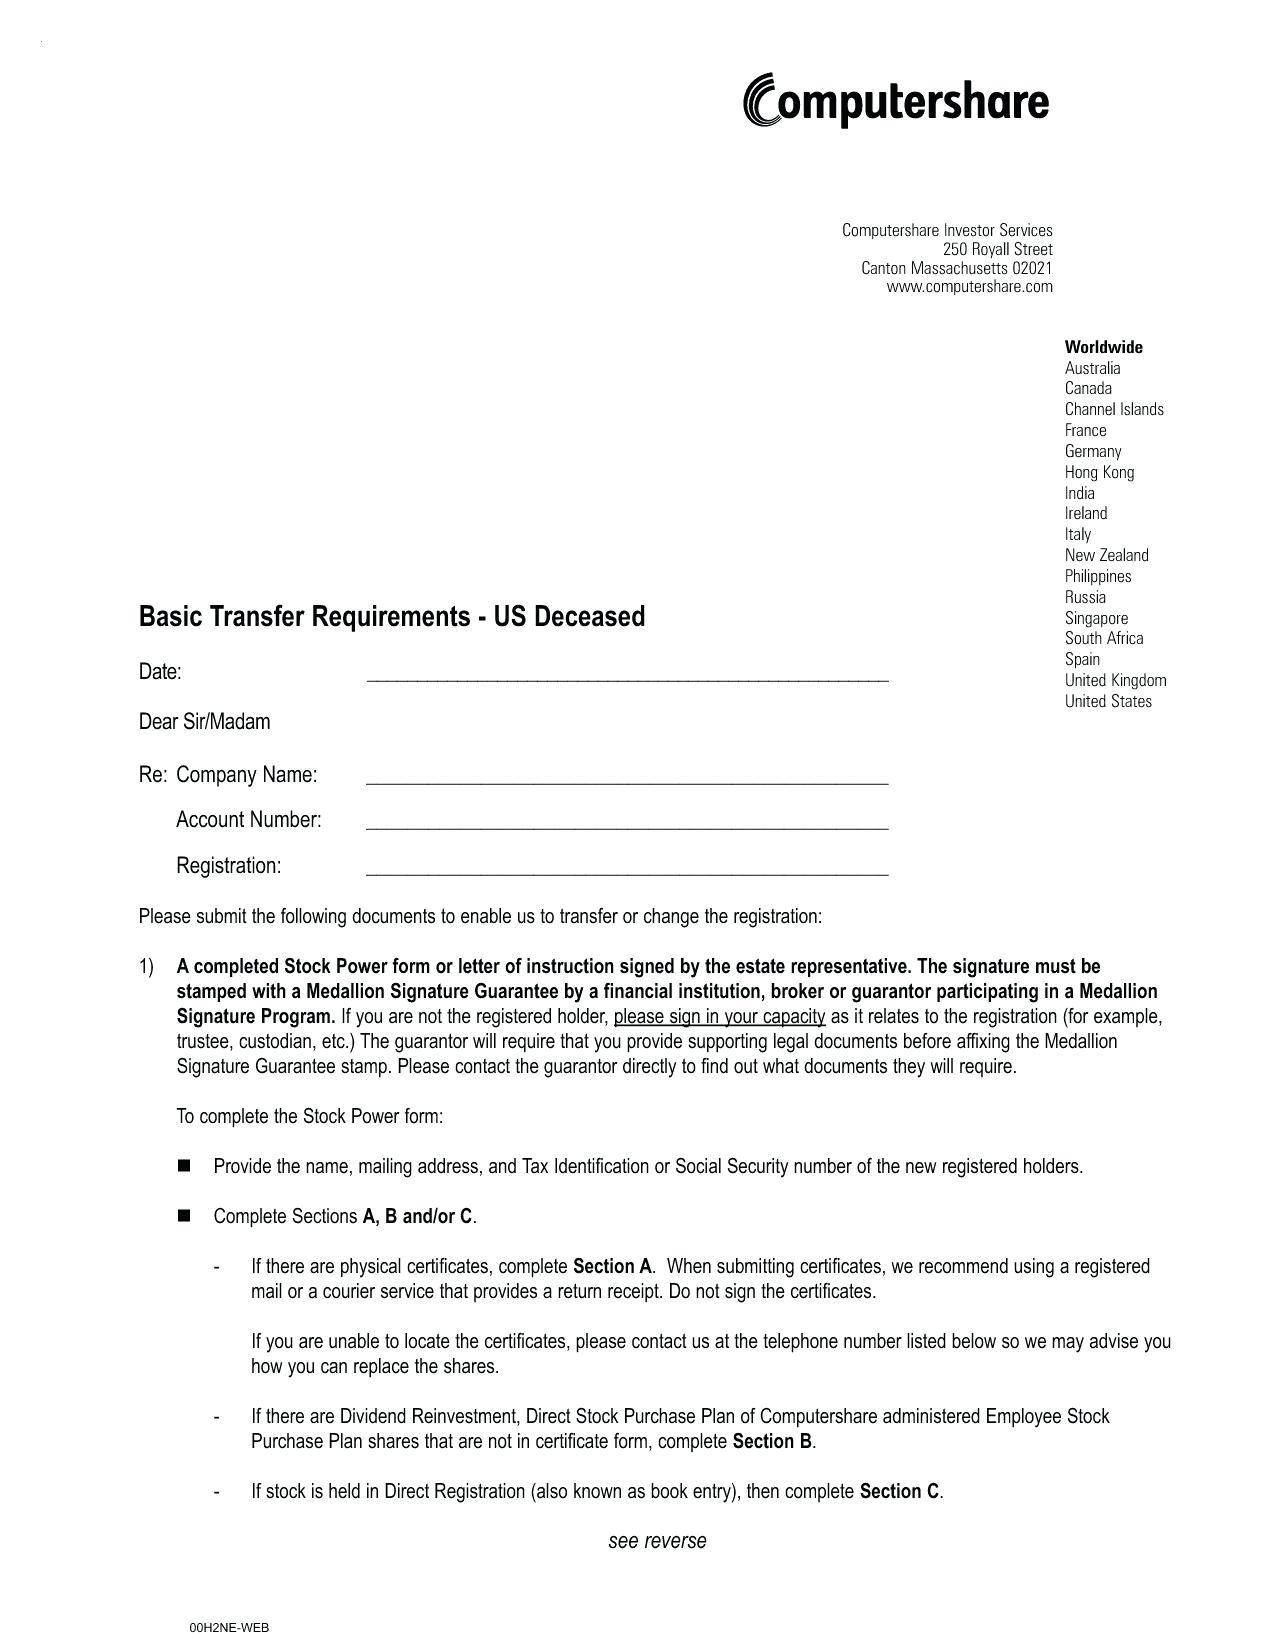 Affidavit Of Loss Word Template